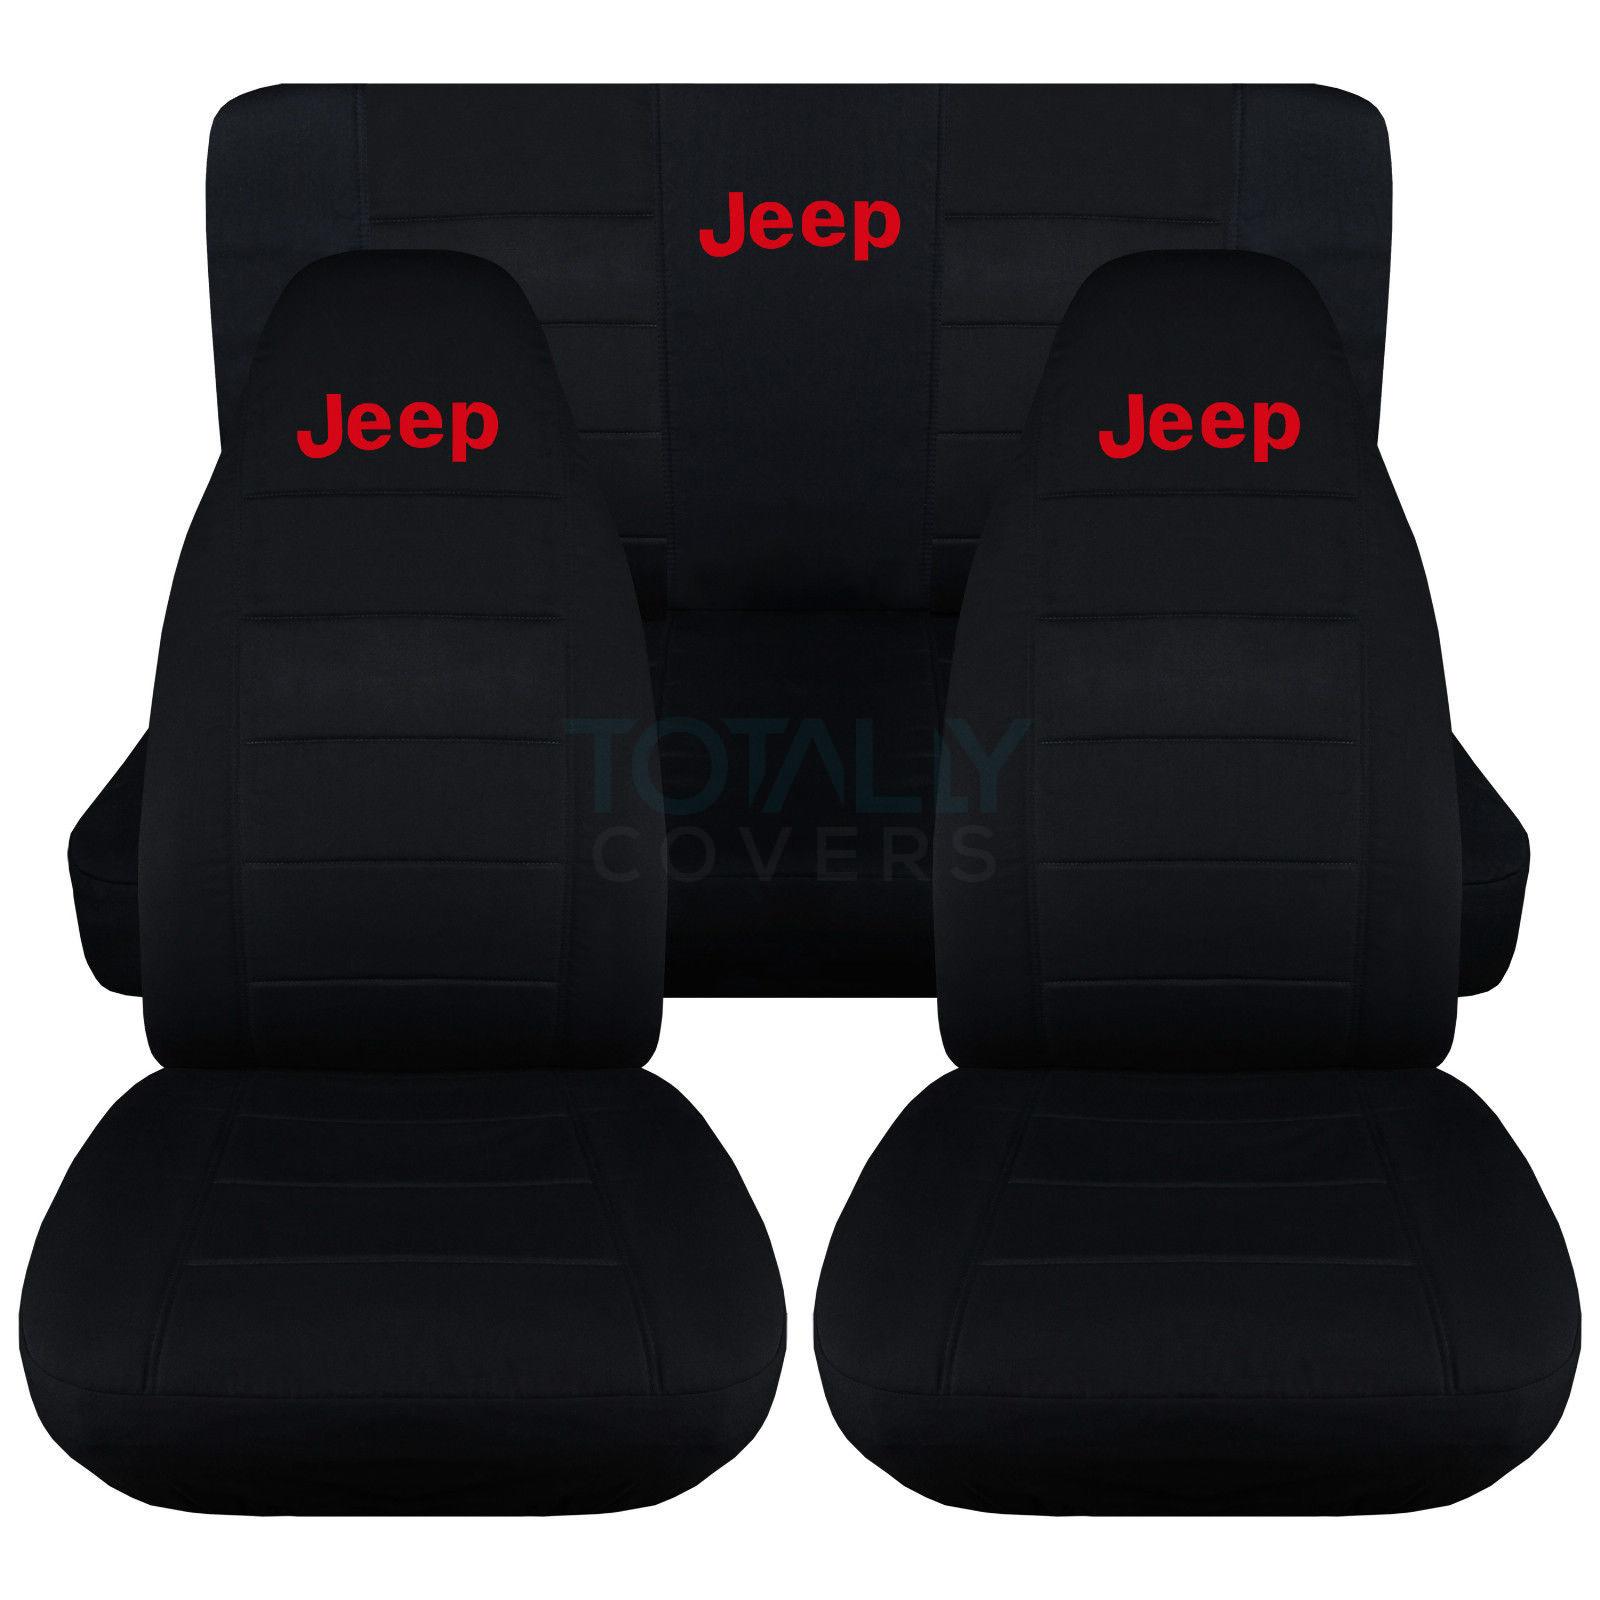 Jeep Wrangler Yj Tj Jk 1987 2018 Black Seat Covers W Logo